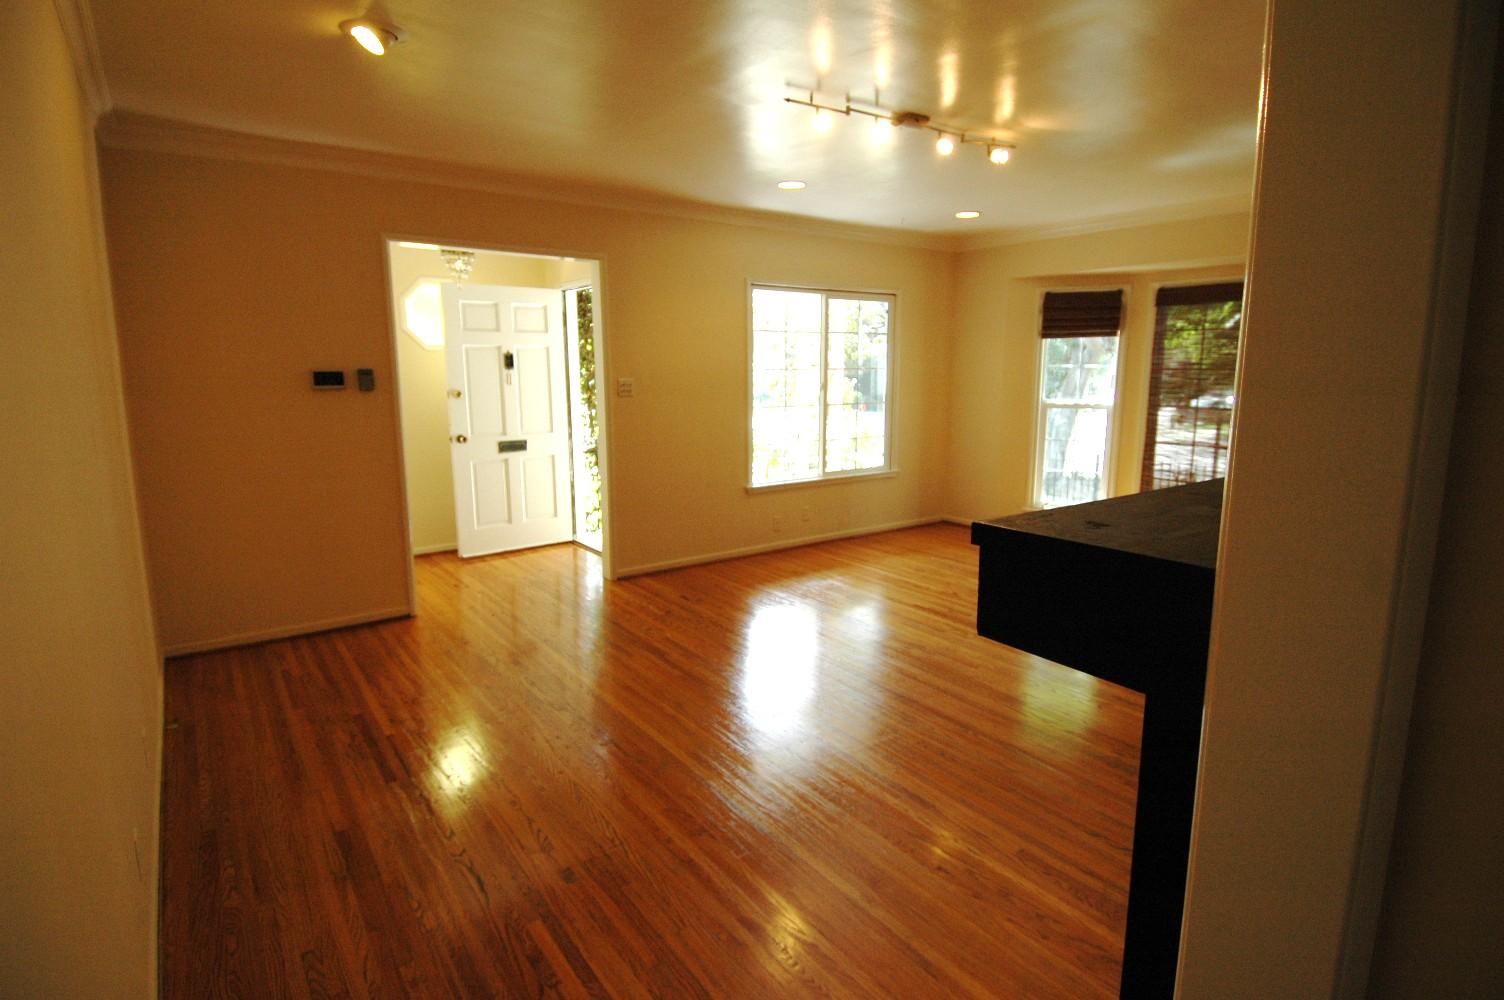 Residential Properties Real Estate Amp Housing Ron Michael